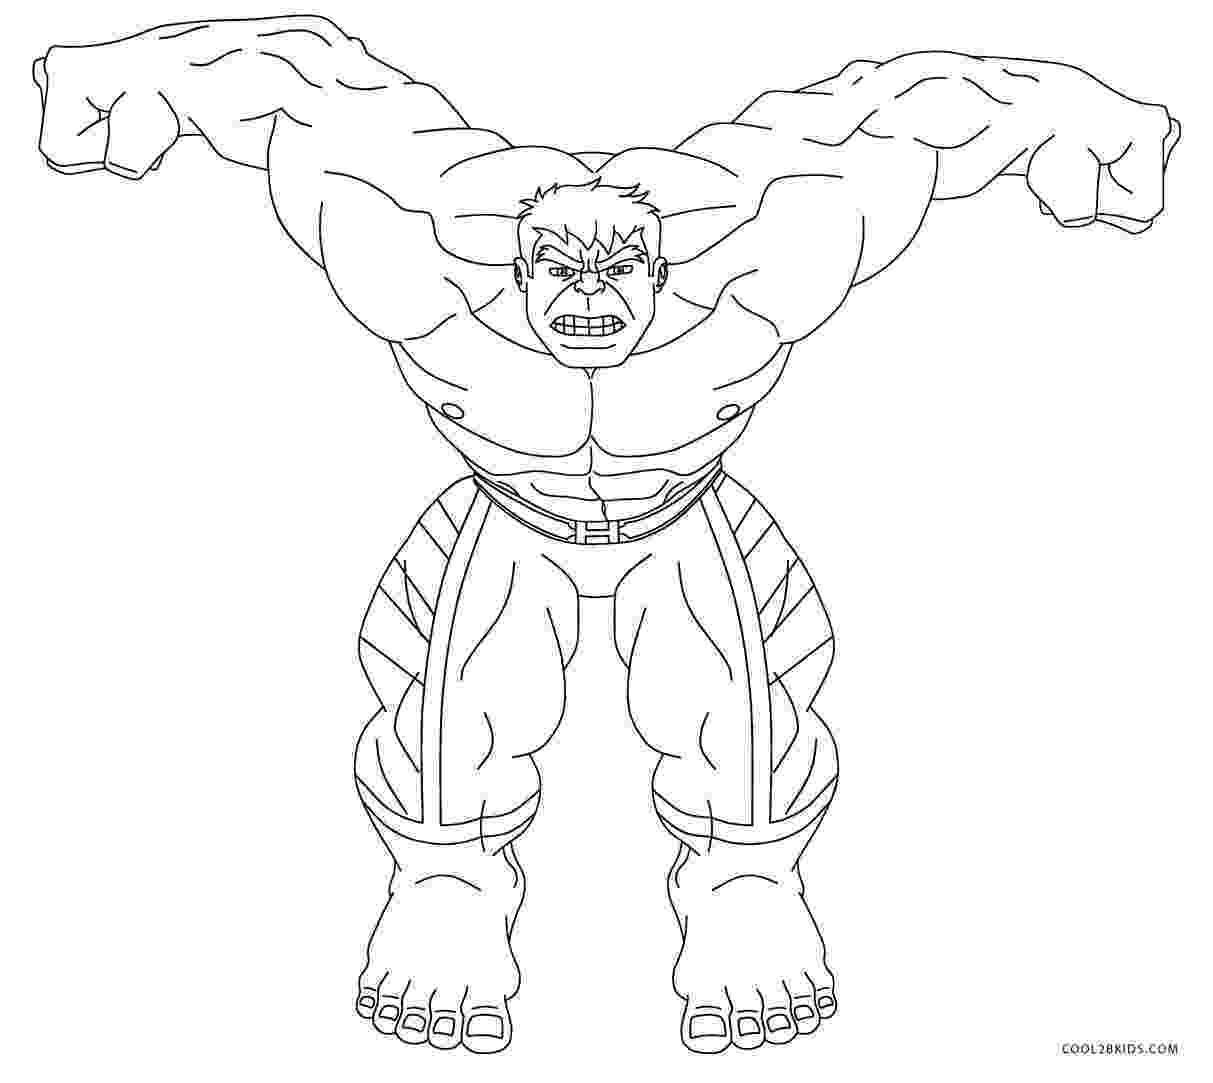 coloring pages hulk free printable hulk coloring pages for kids cool2bkids coloring hulk pages